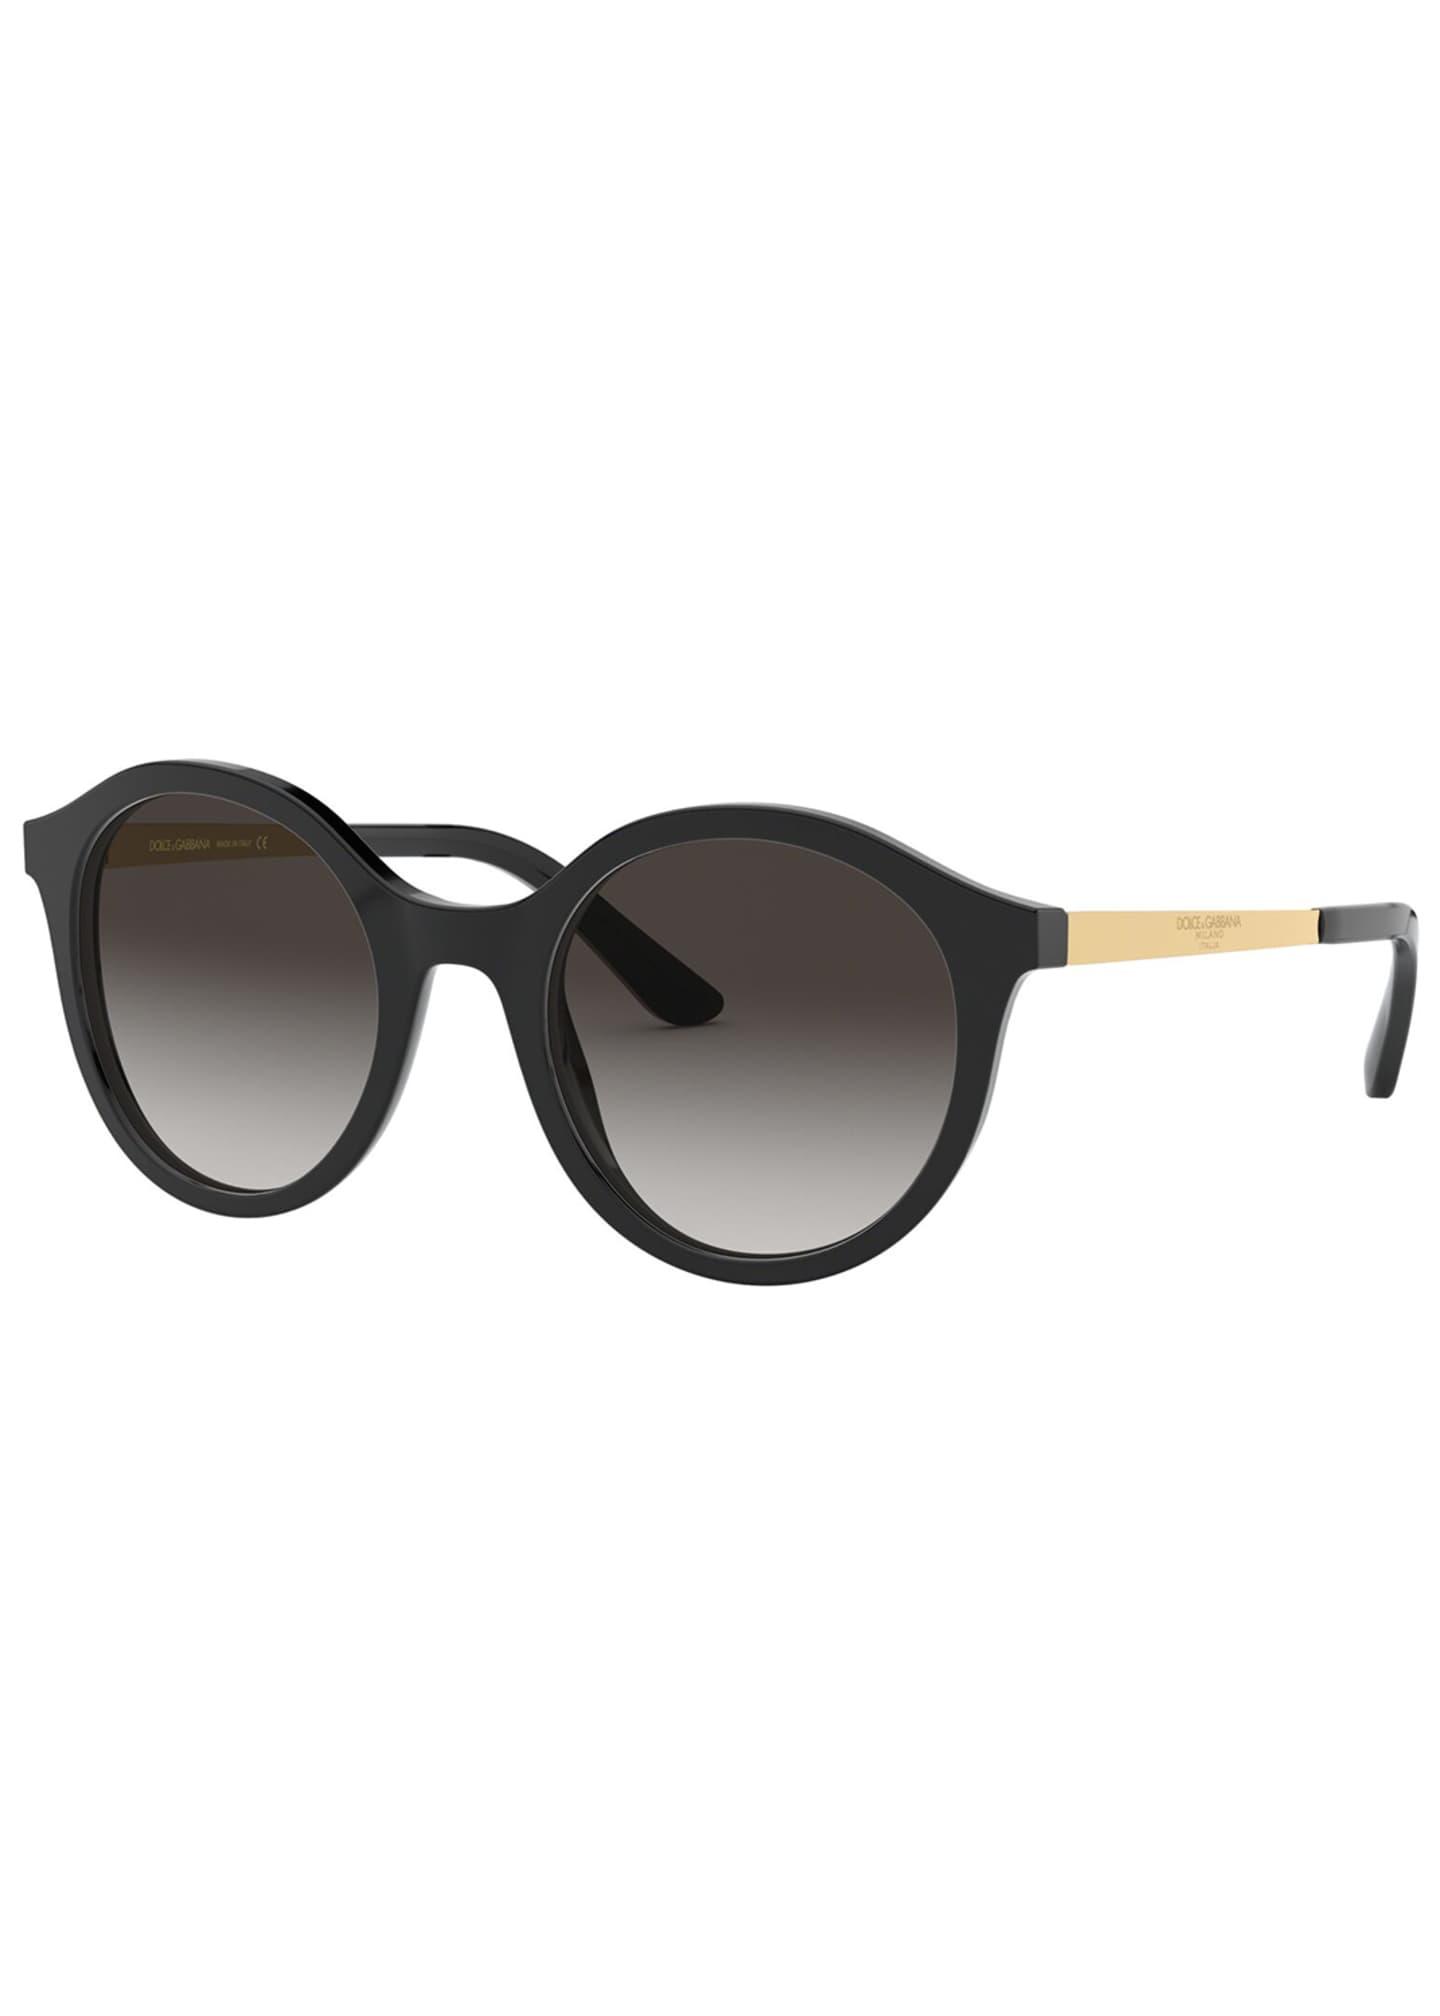 Dolce & Gabbana Metal & Acetate Round Sunglasses